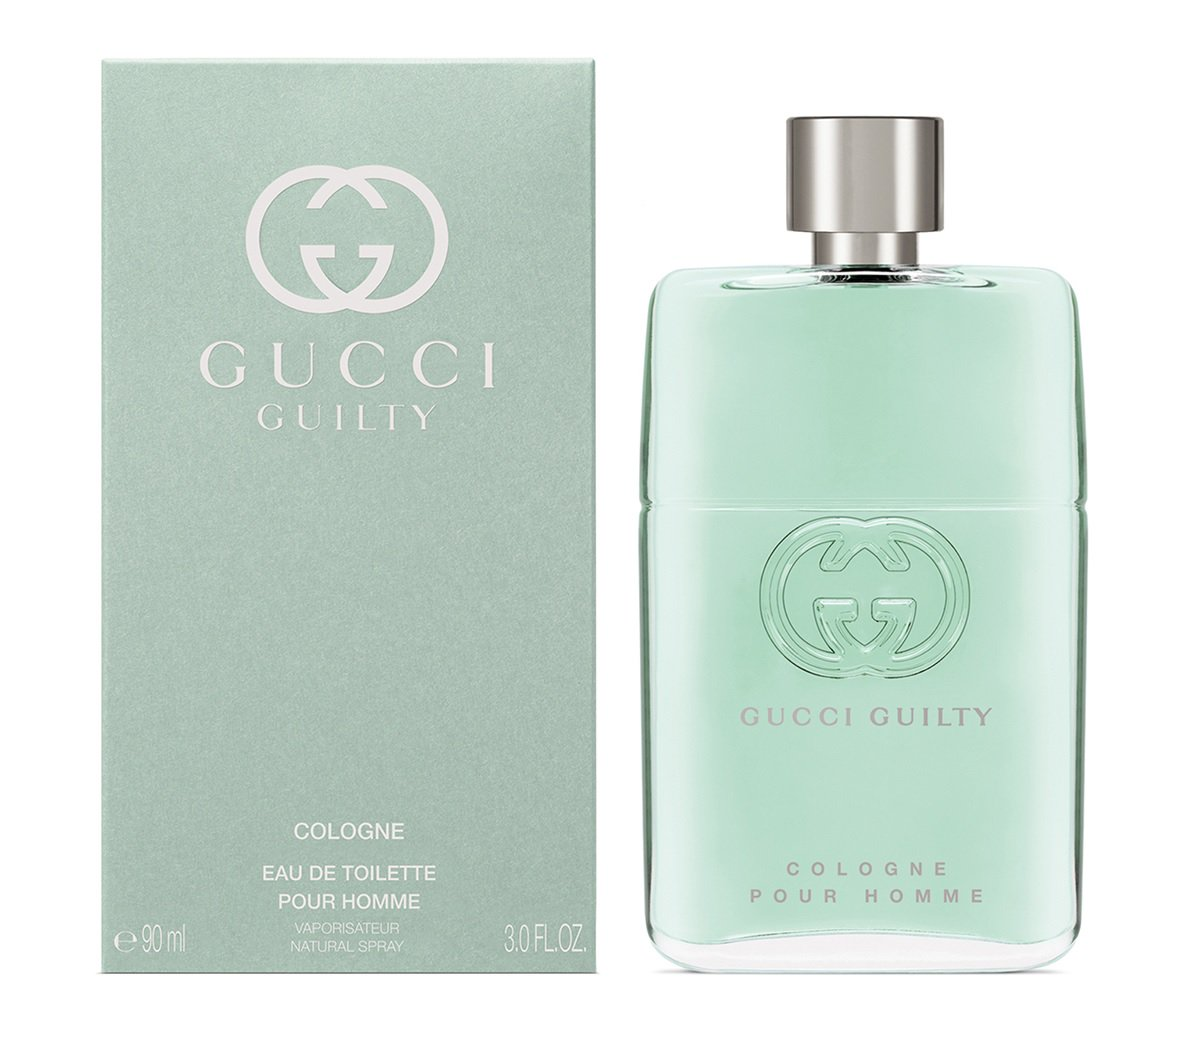 Gucci Guilty Cologne pour Homme Perfume